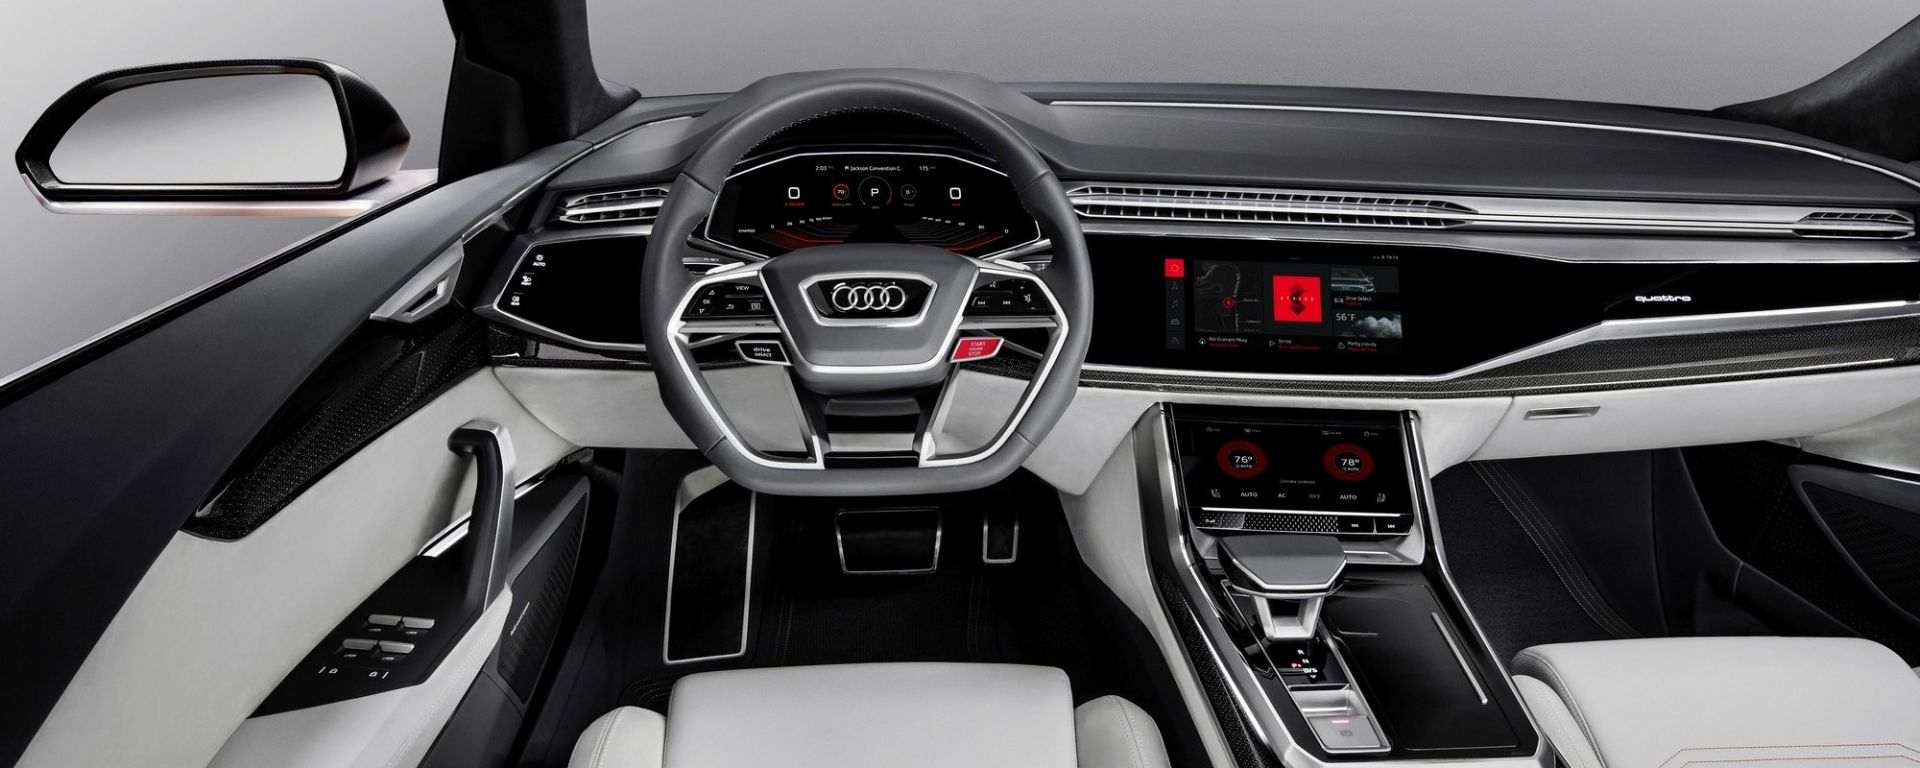 Audi Q8, l'infotainmet sarà su base Android